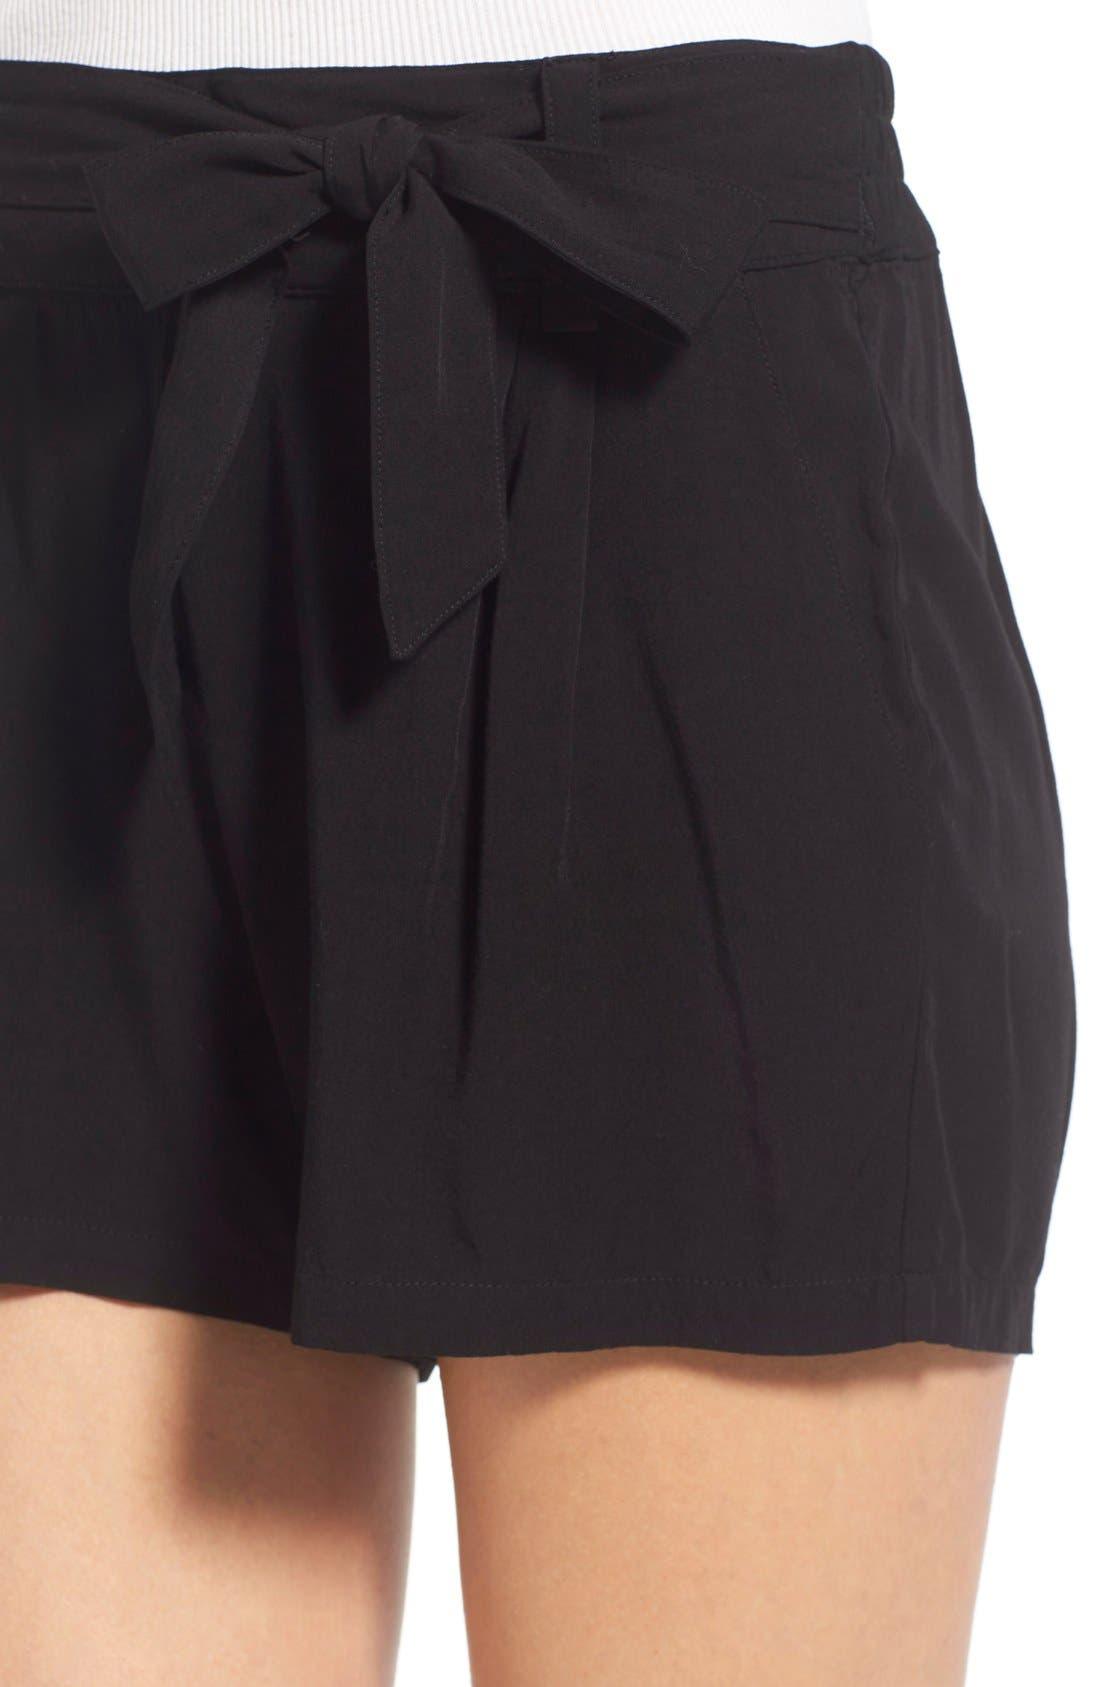 SPLENDID, Tie Front Shorts, Alternate thumbnail 5, color, 001